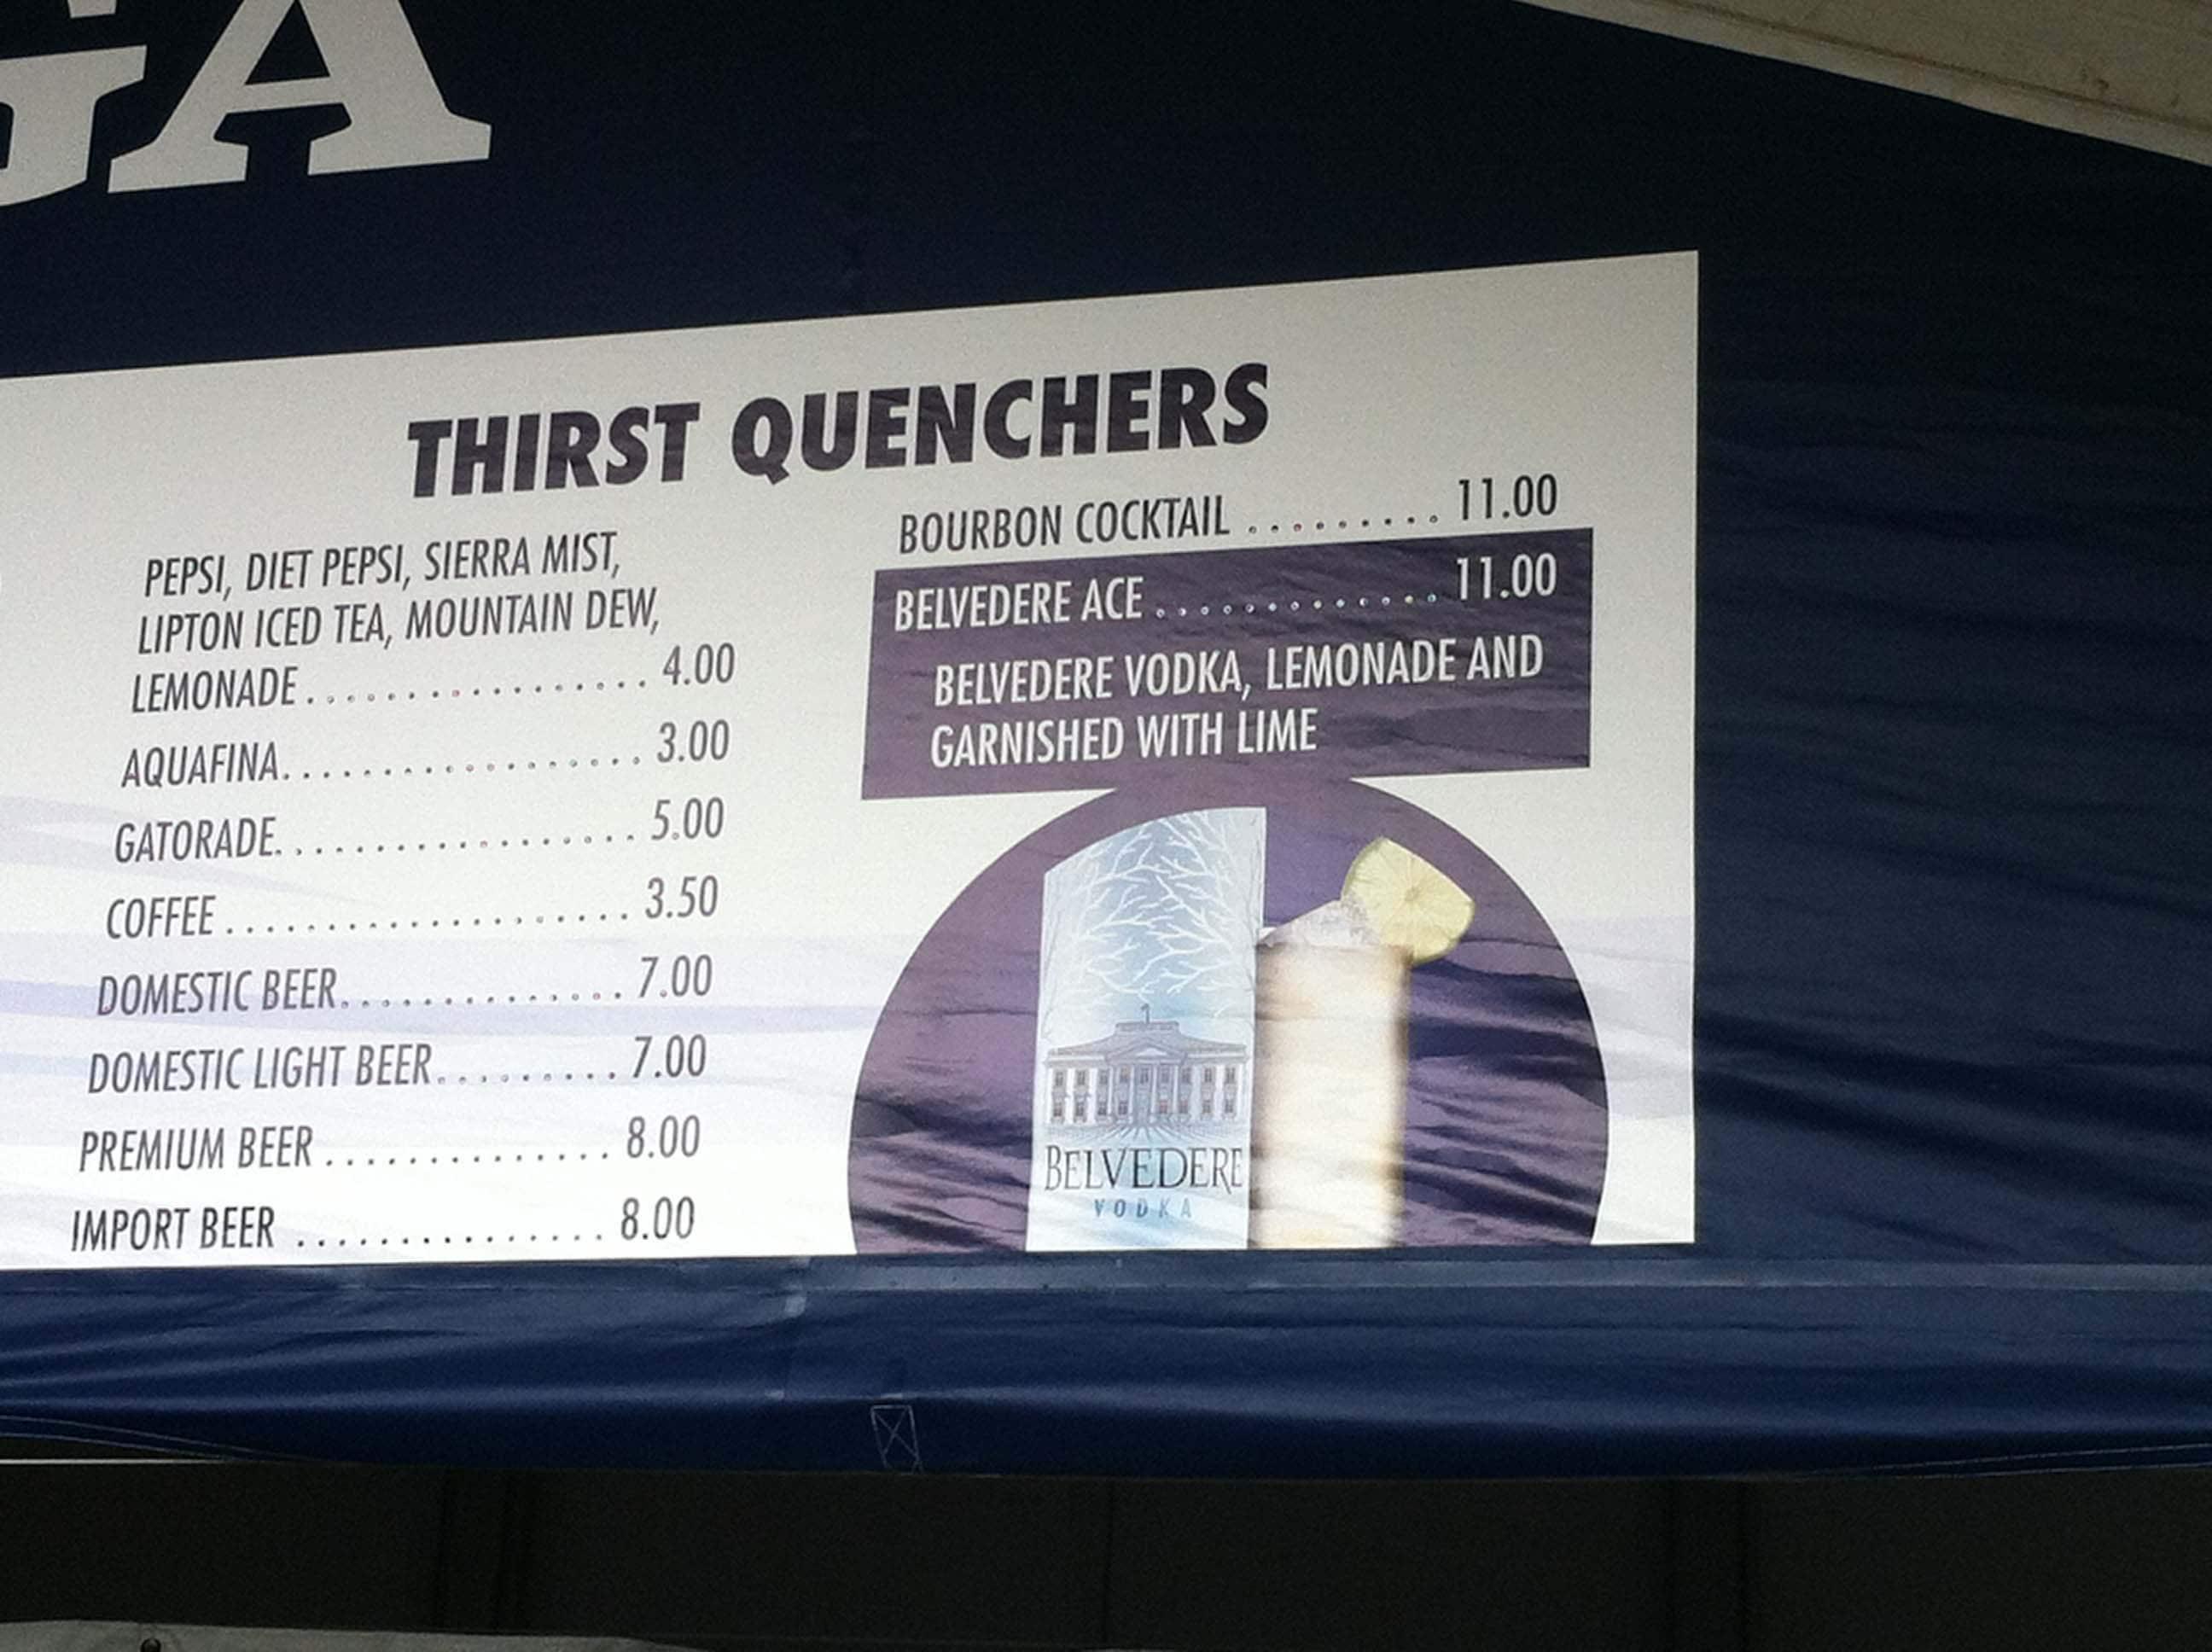 It's $11 drink day. Let's celebrate!